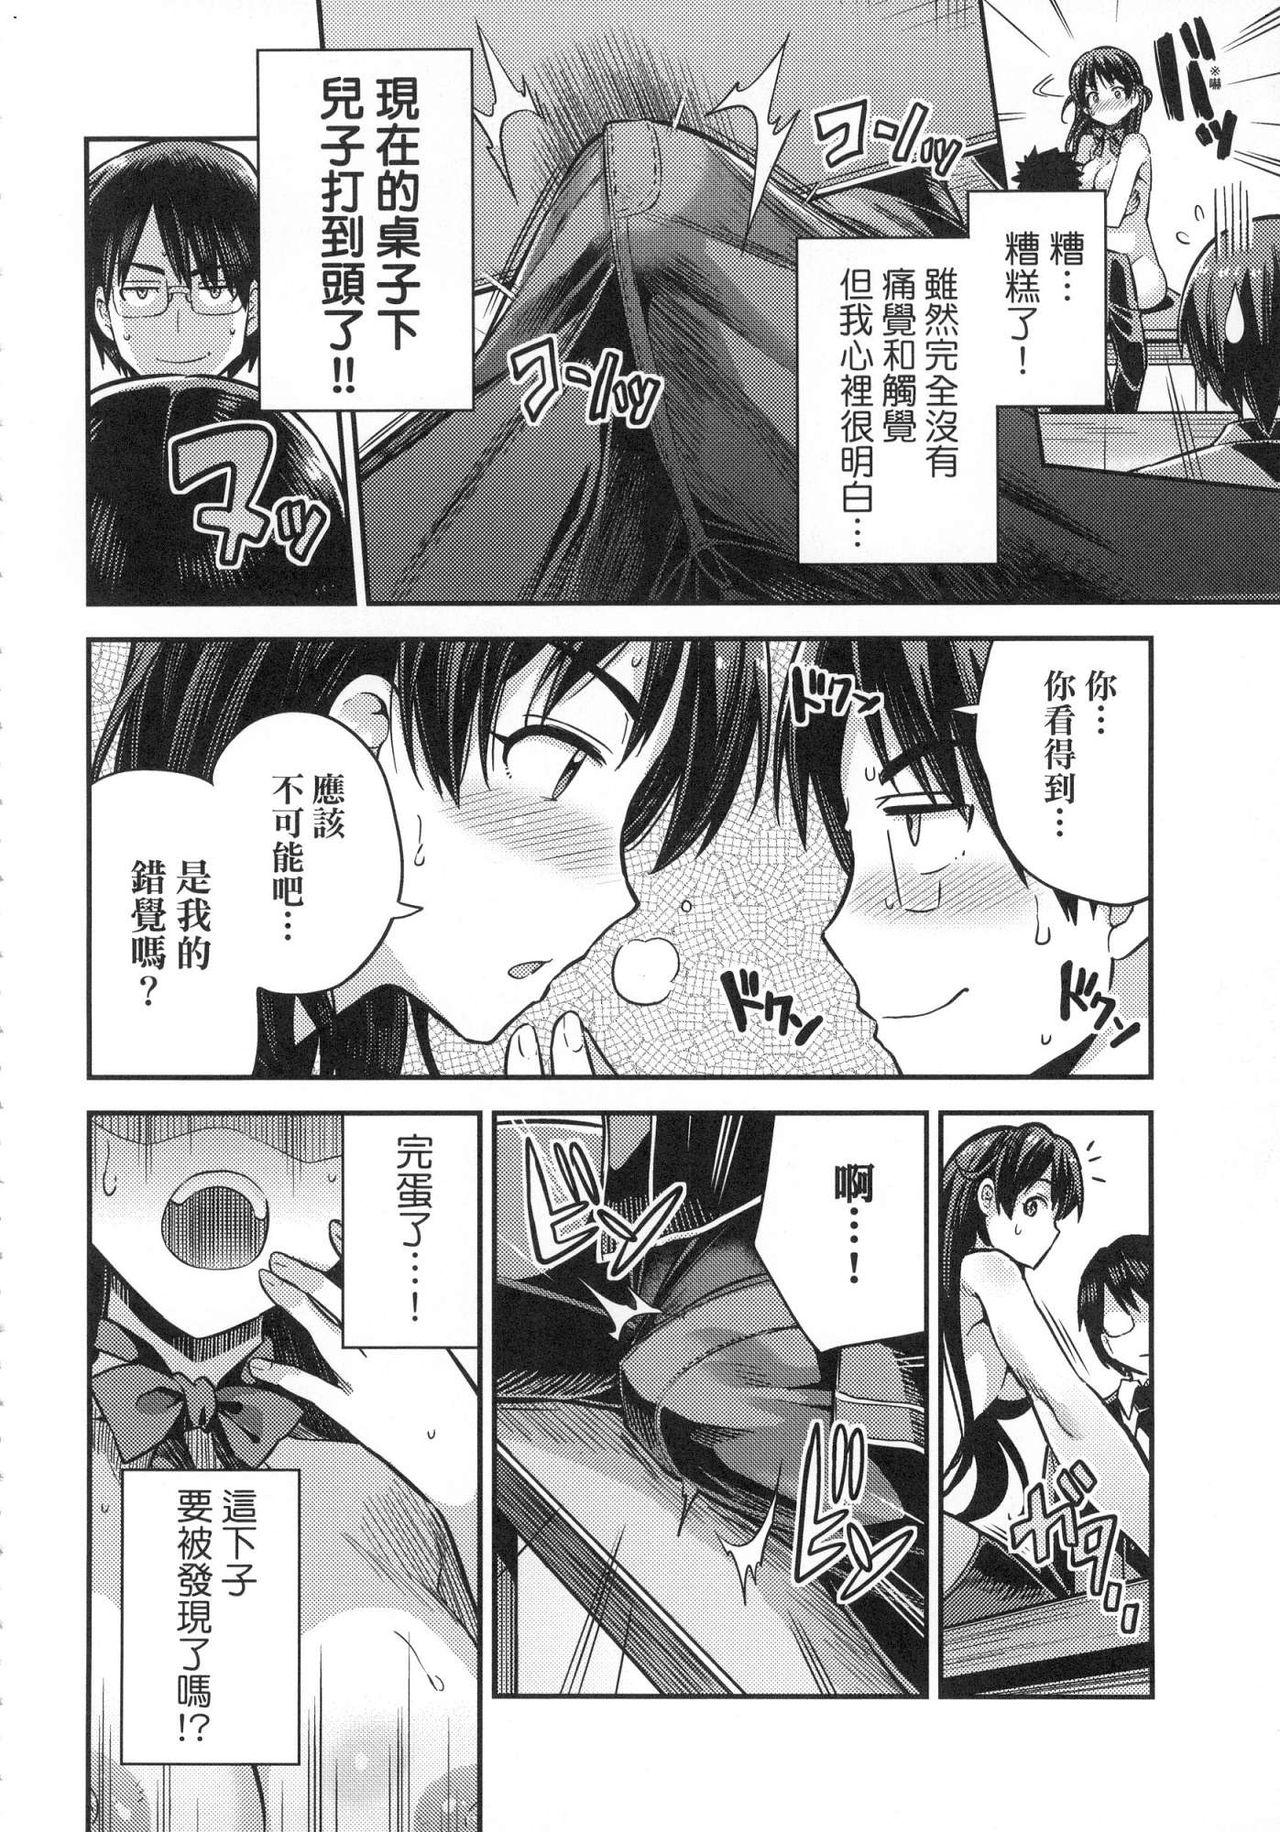 Kyousei Tanetsuke Express - Forced Seeding Express 33